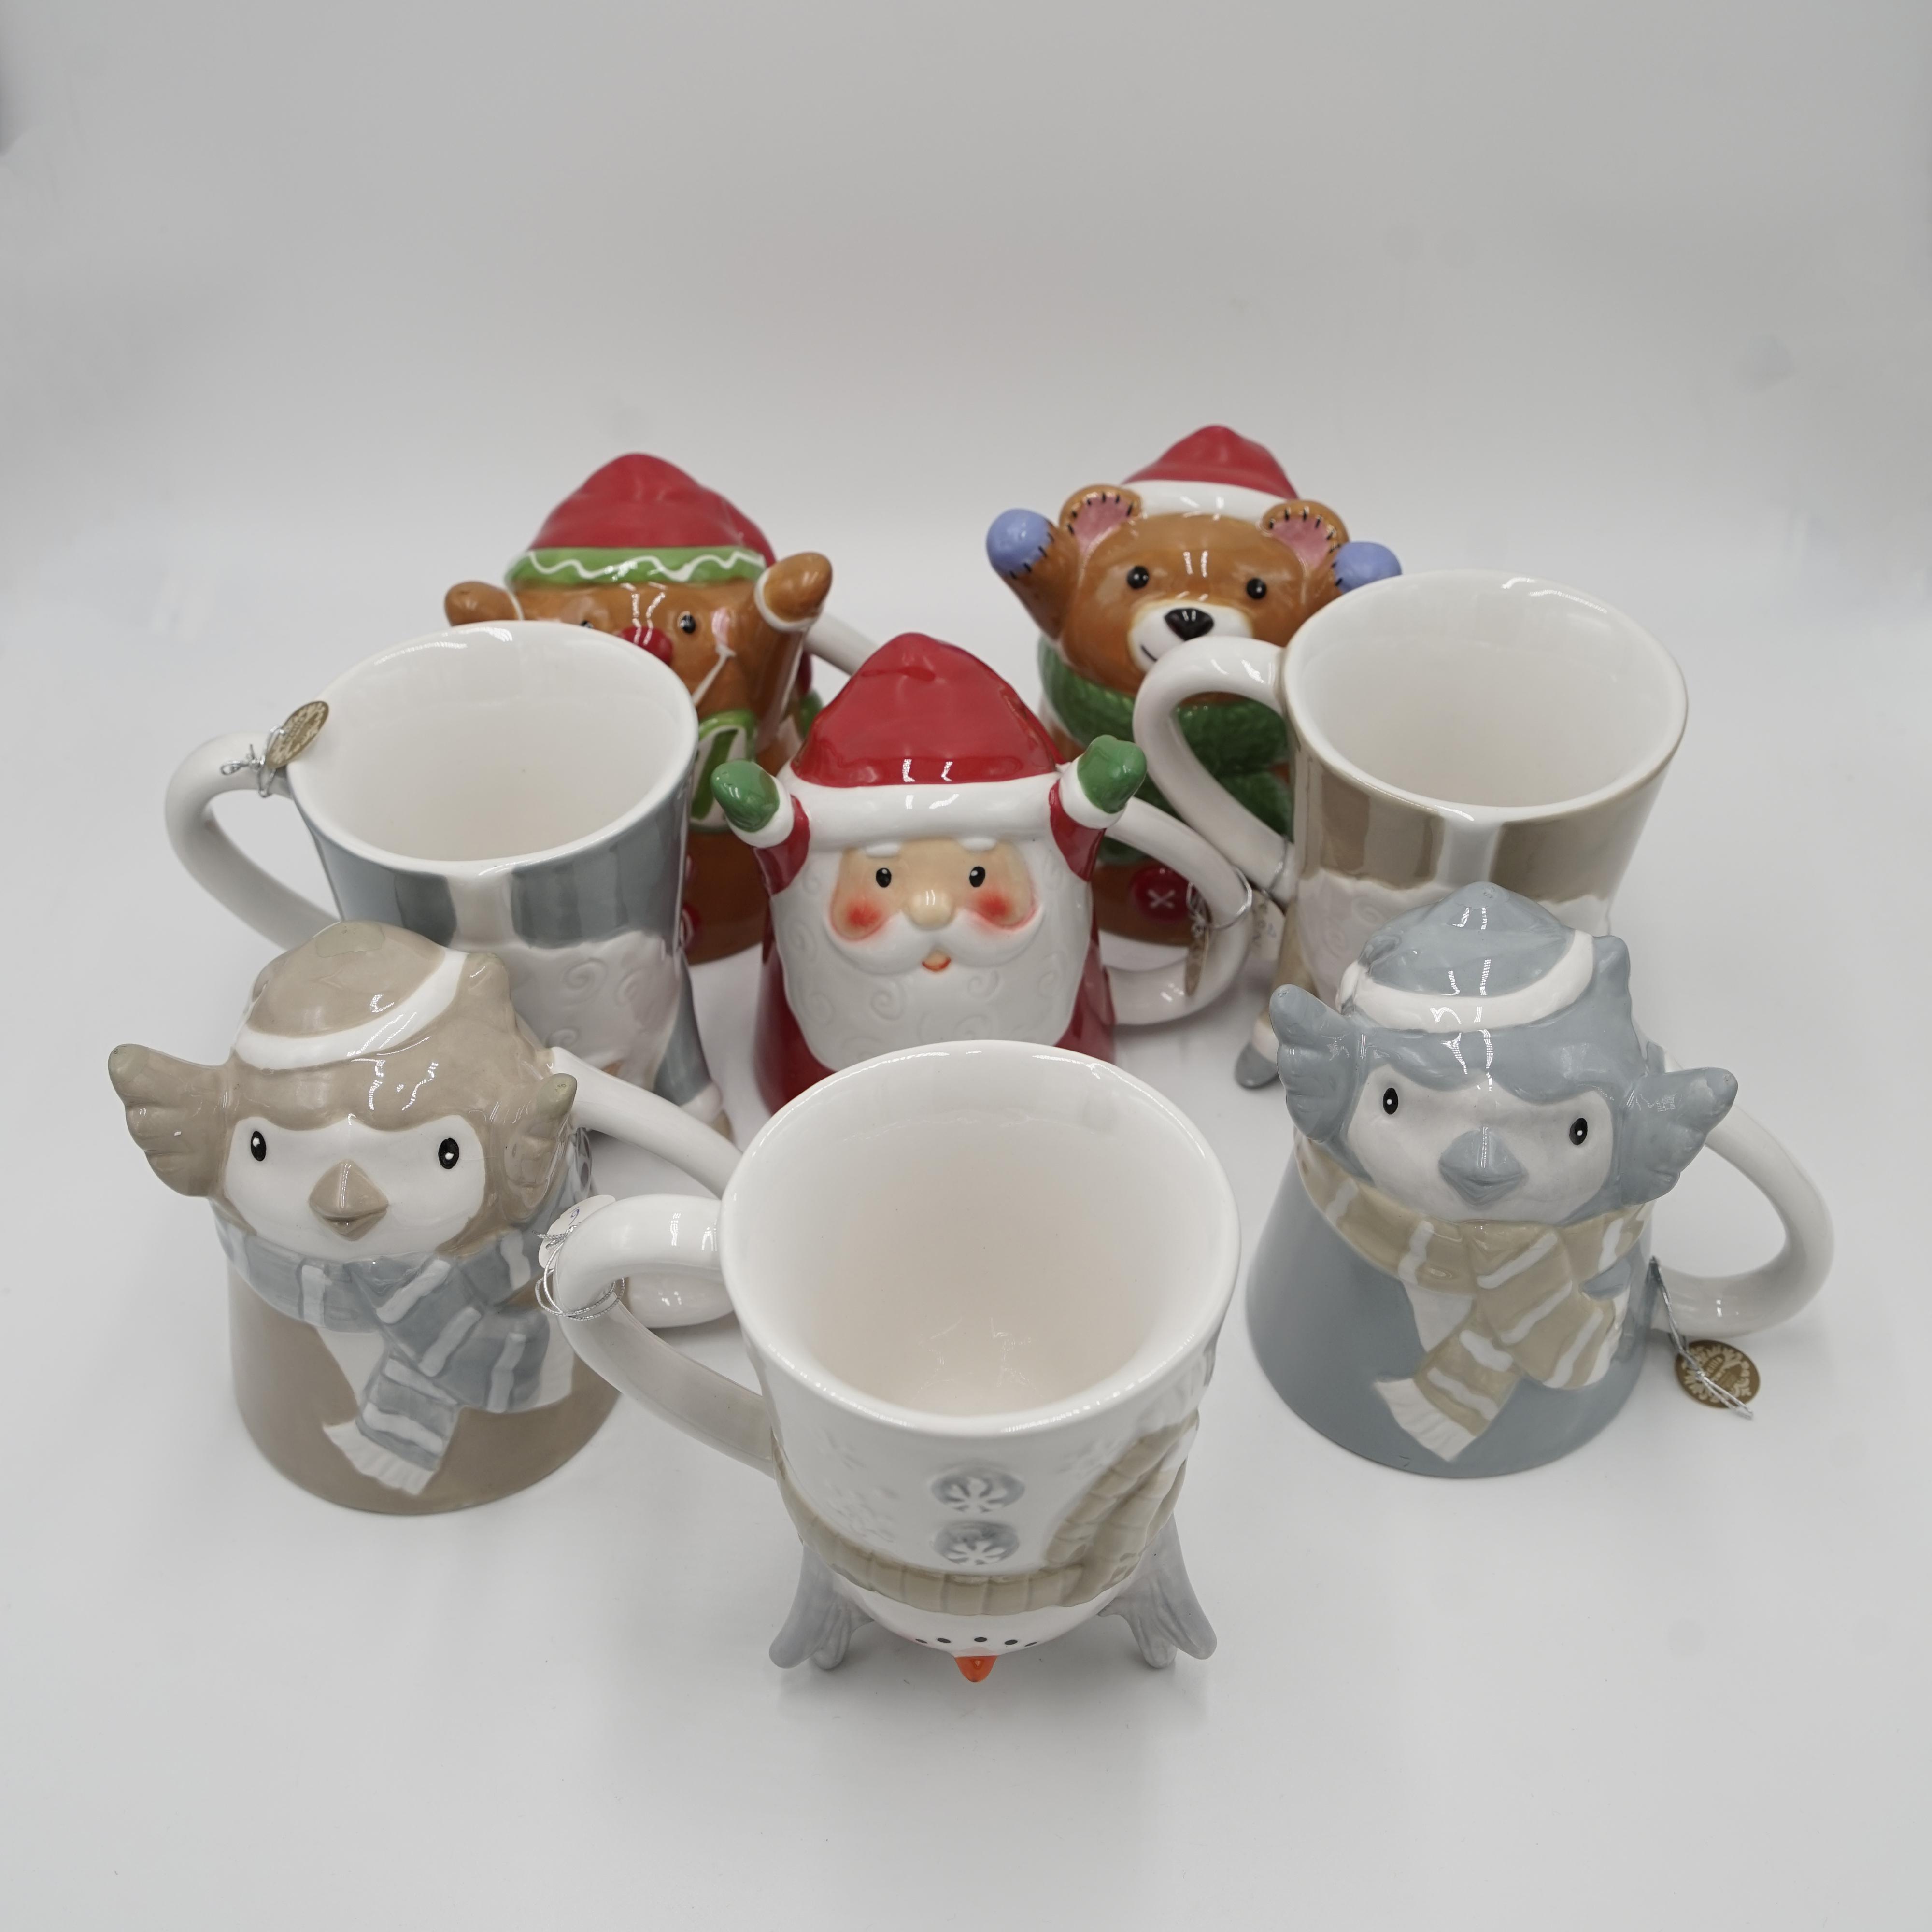 Tazza mug in porcellana